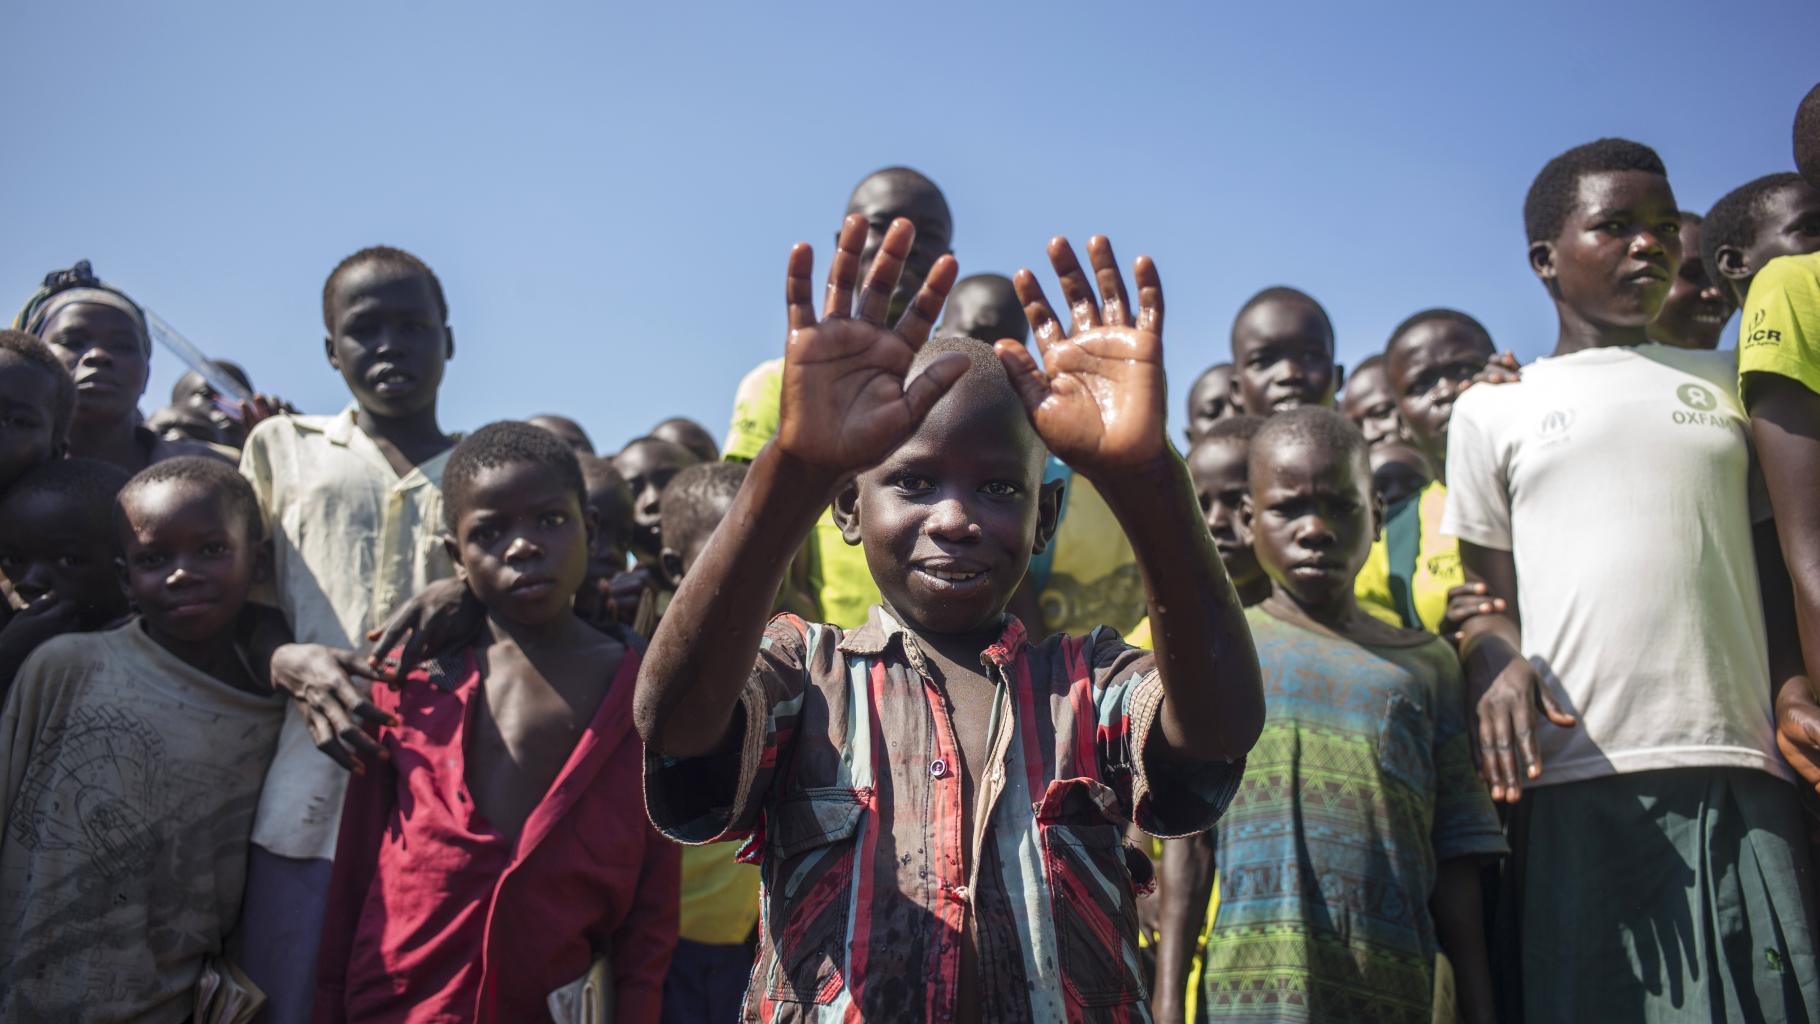 Georgeas aus dem Südsudan in der Flüchtlingssiedlung in Uganda